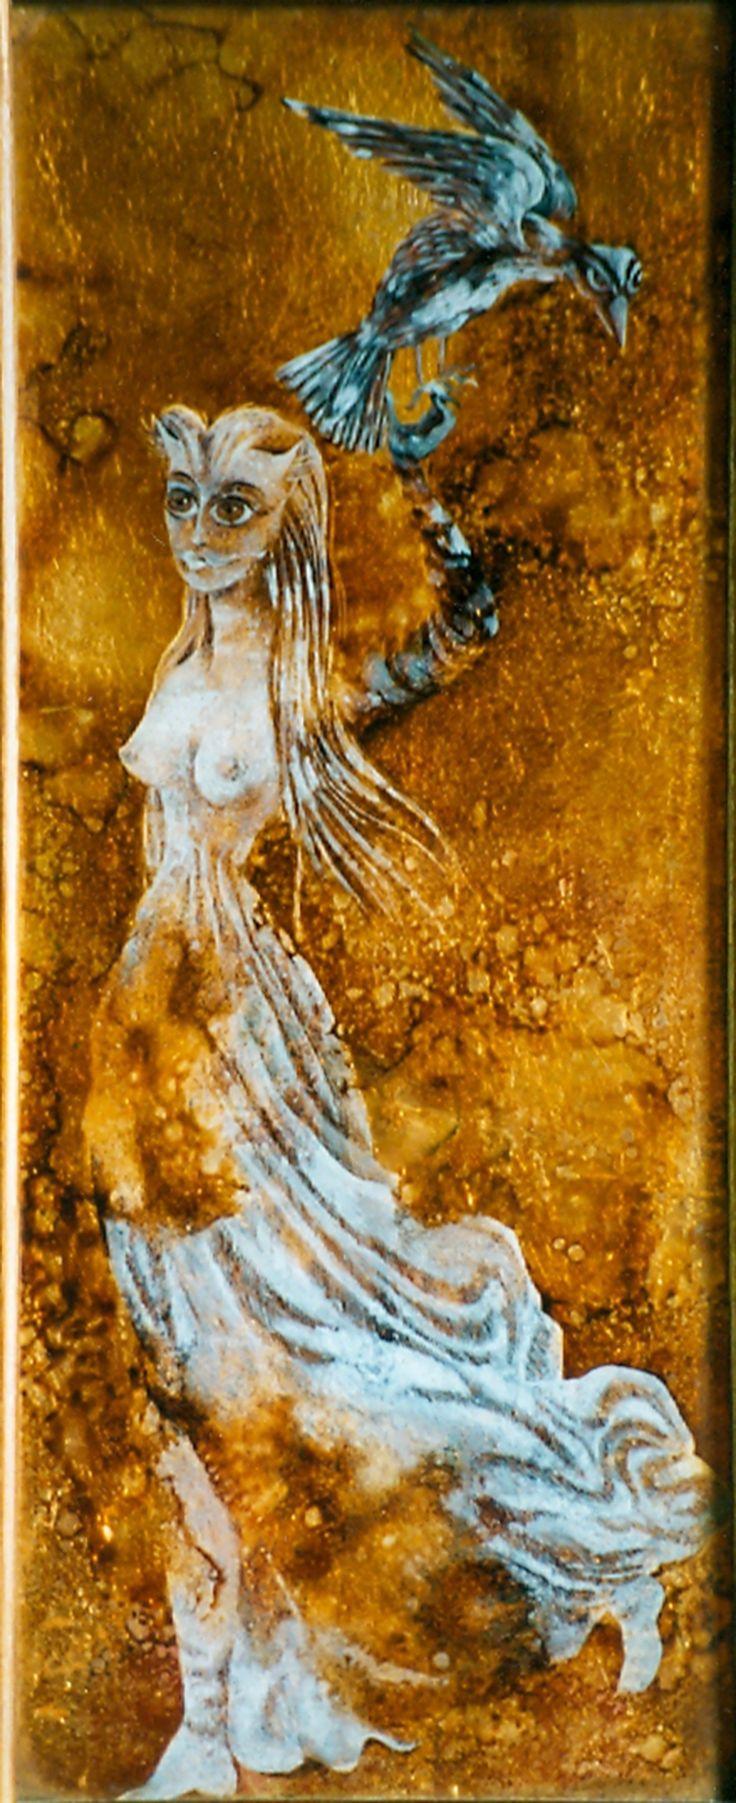 Woman and Bird, 1950. – Remedios Varo Remedios Varo